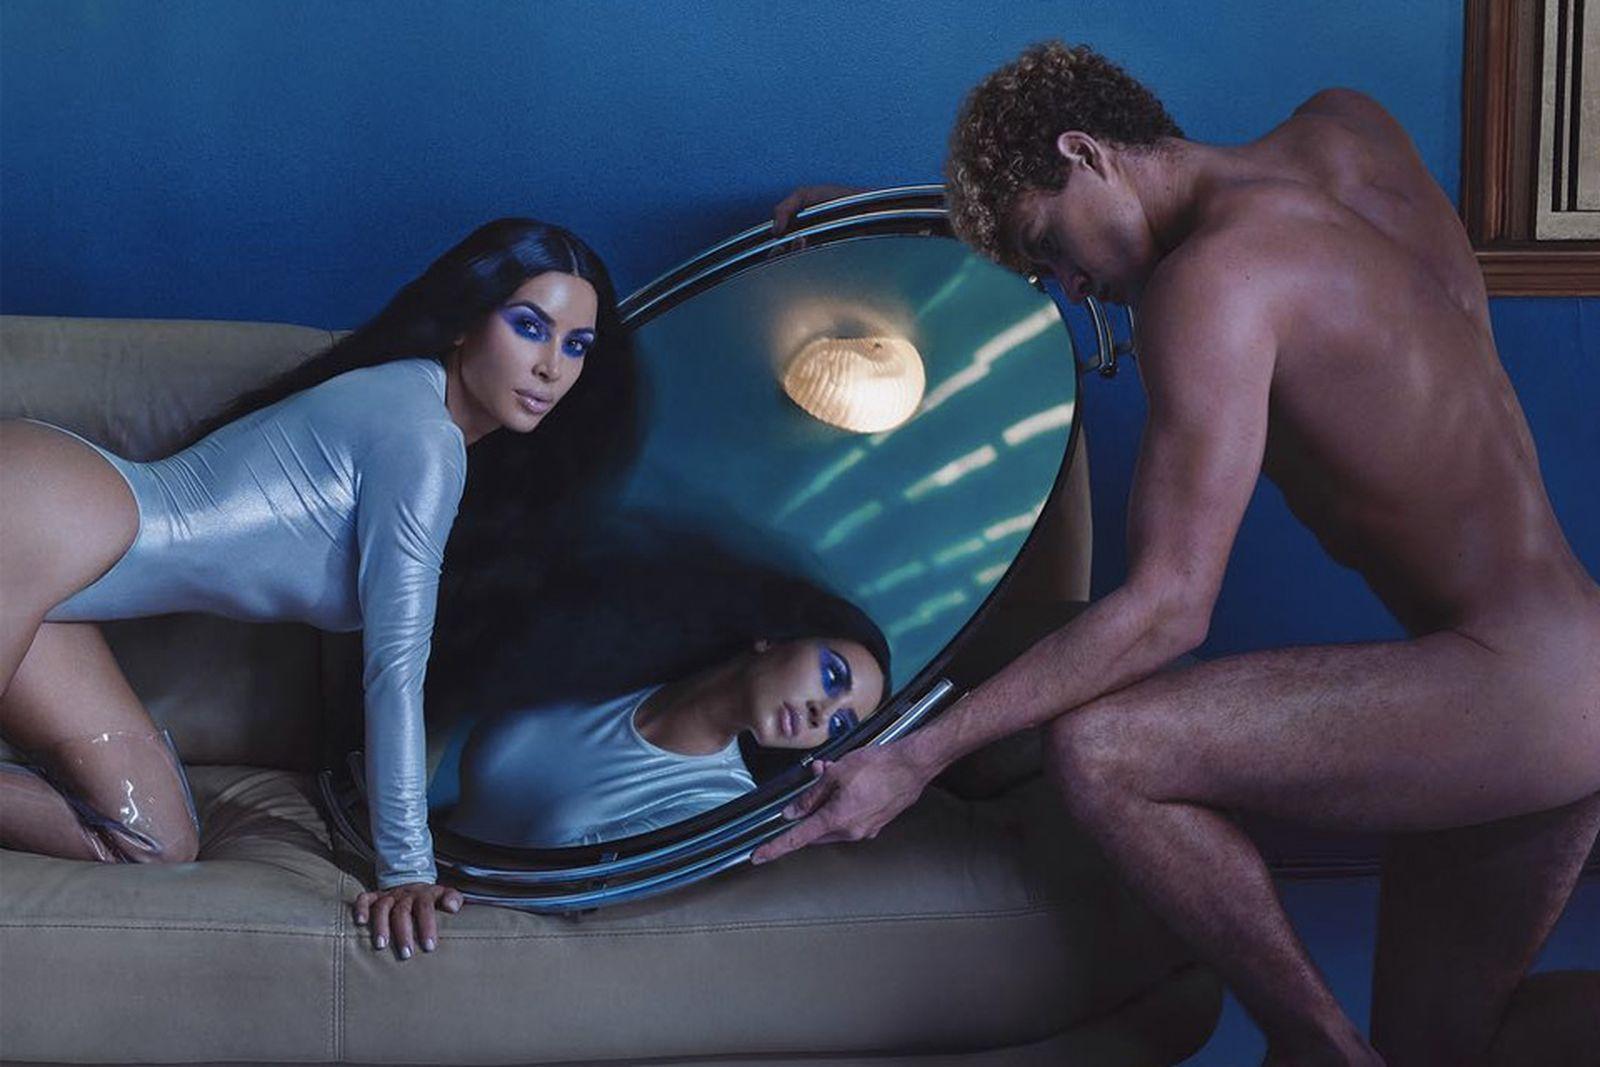 kim-kardashian-west-kkw-david-lachapelle-01